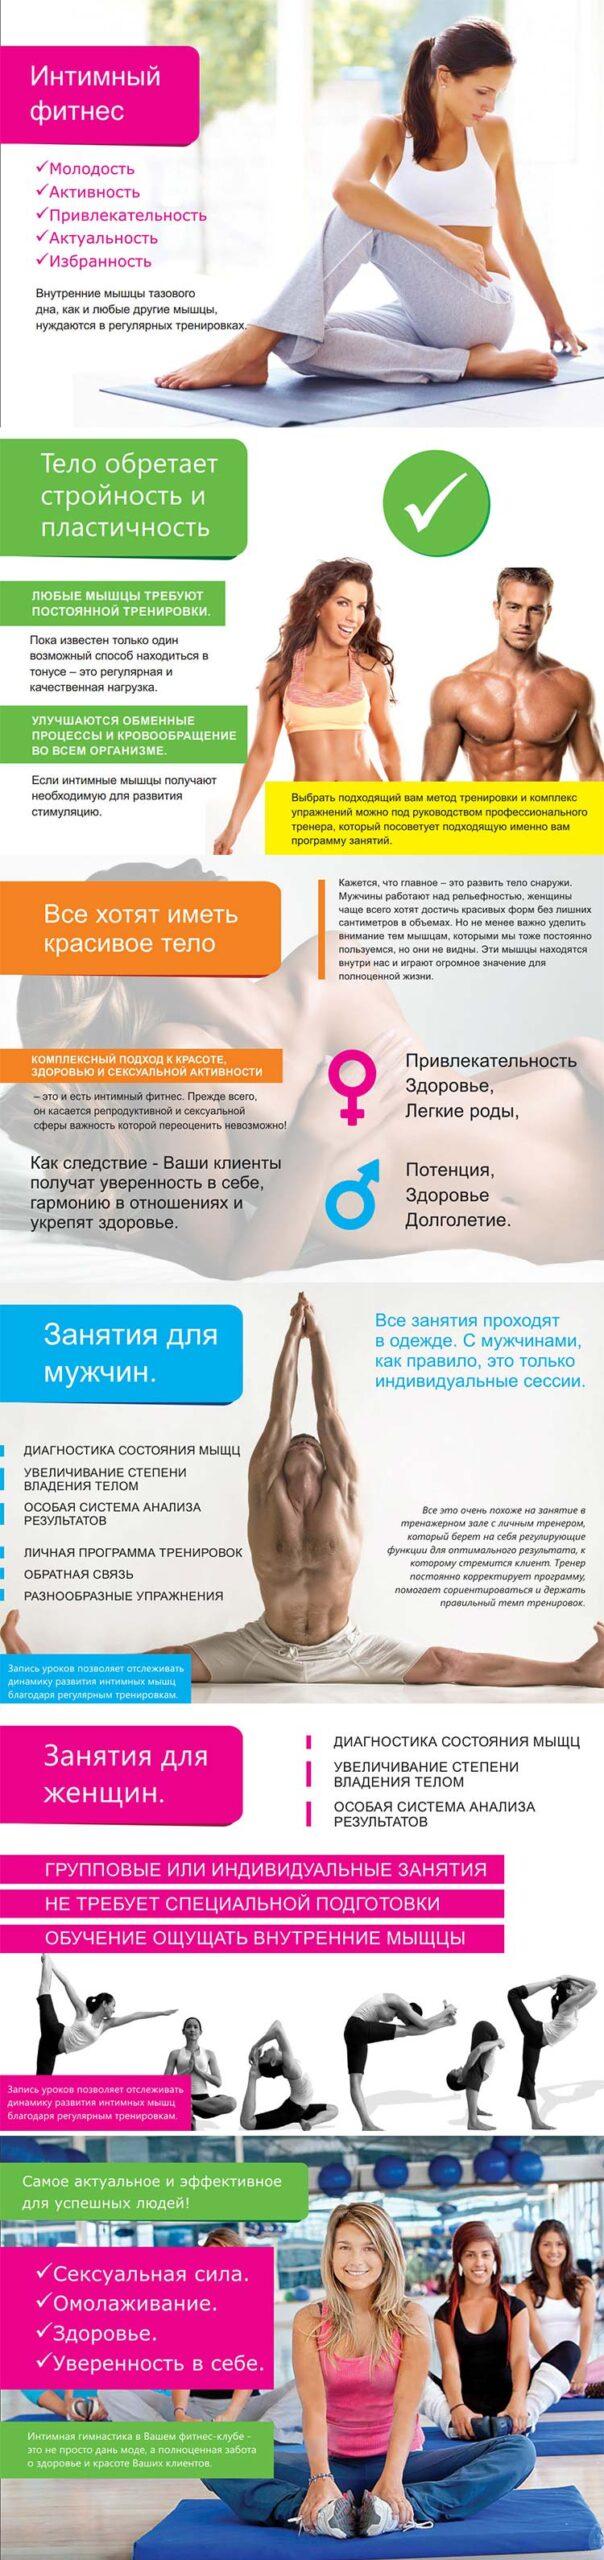 zakazat-Prezentacija-uslugi-Intimnyj-fitnes-v-fitnes-klubah